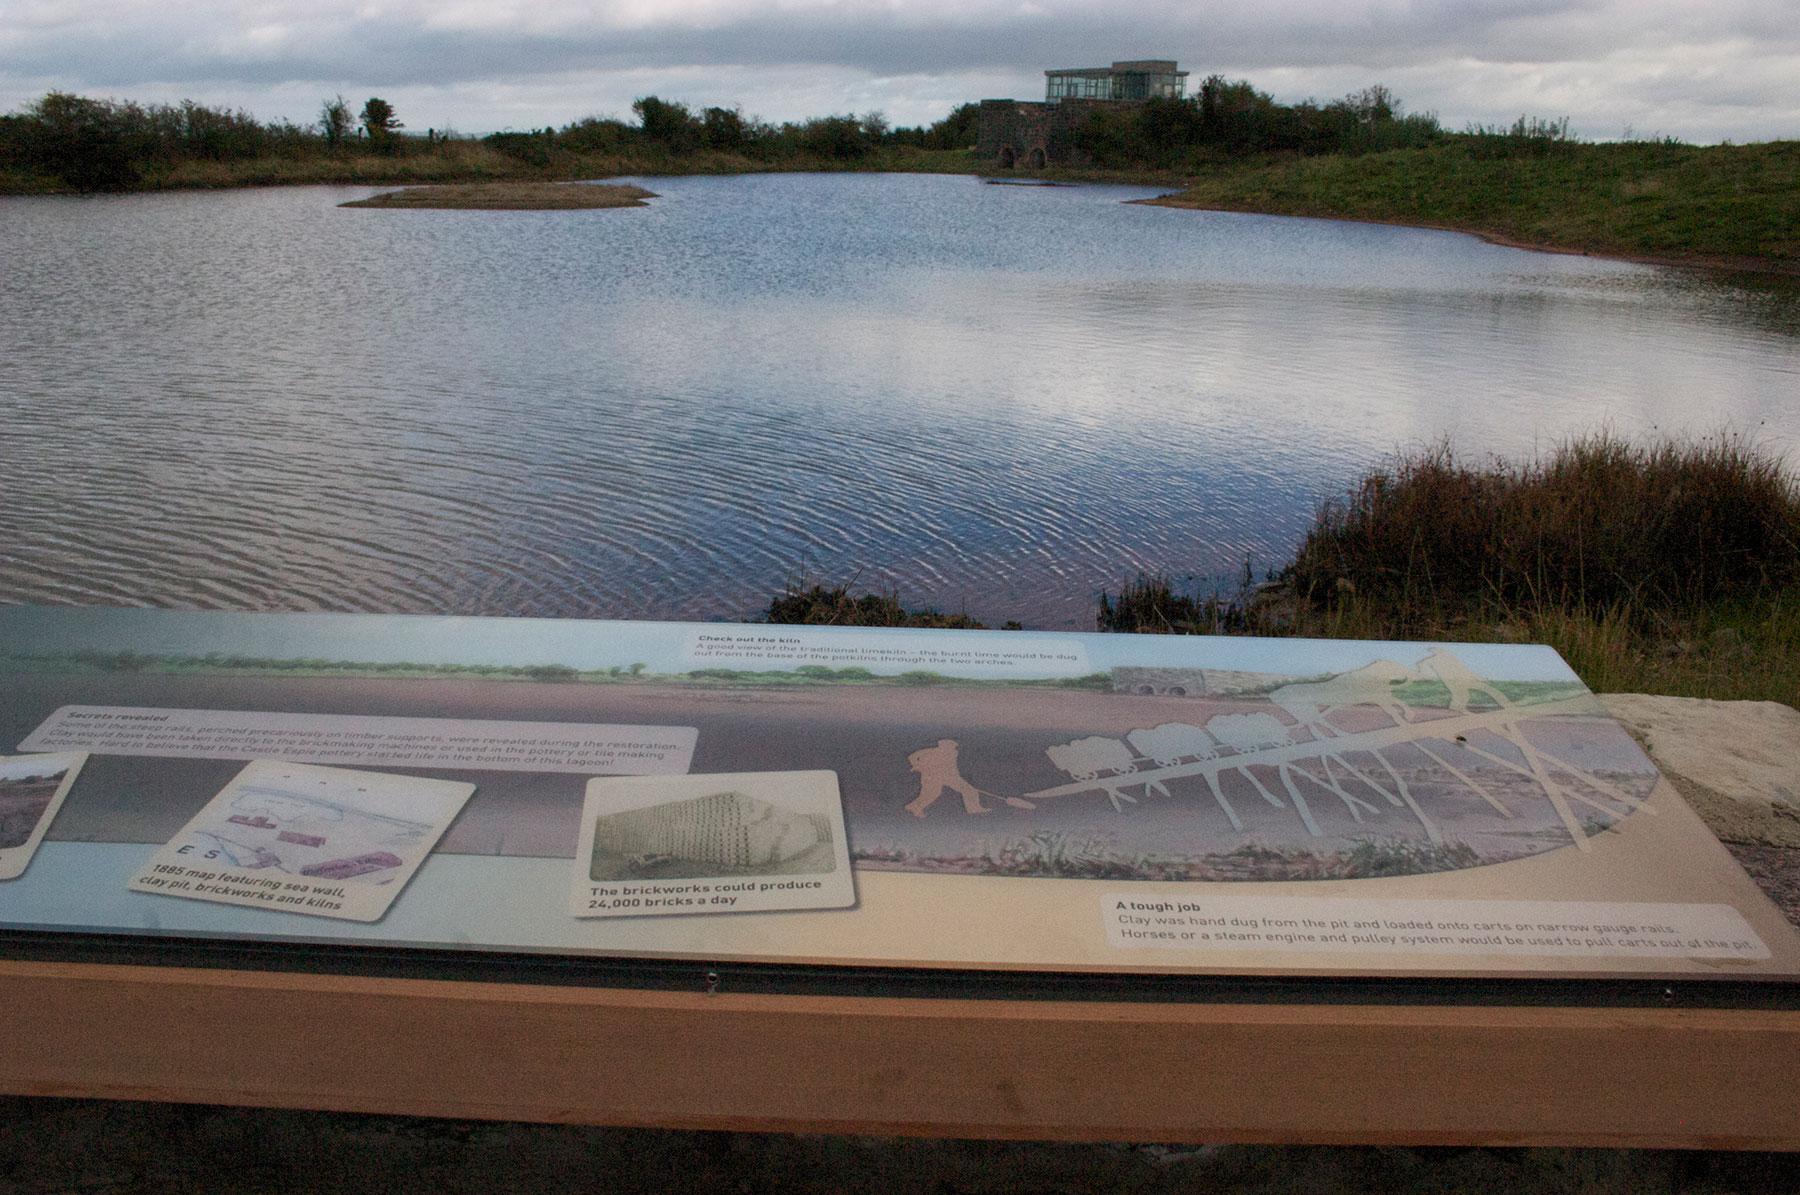 Wetland interpretation